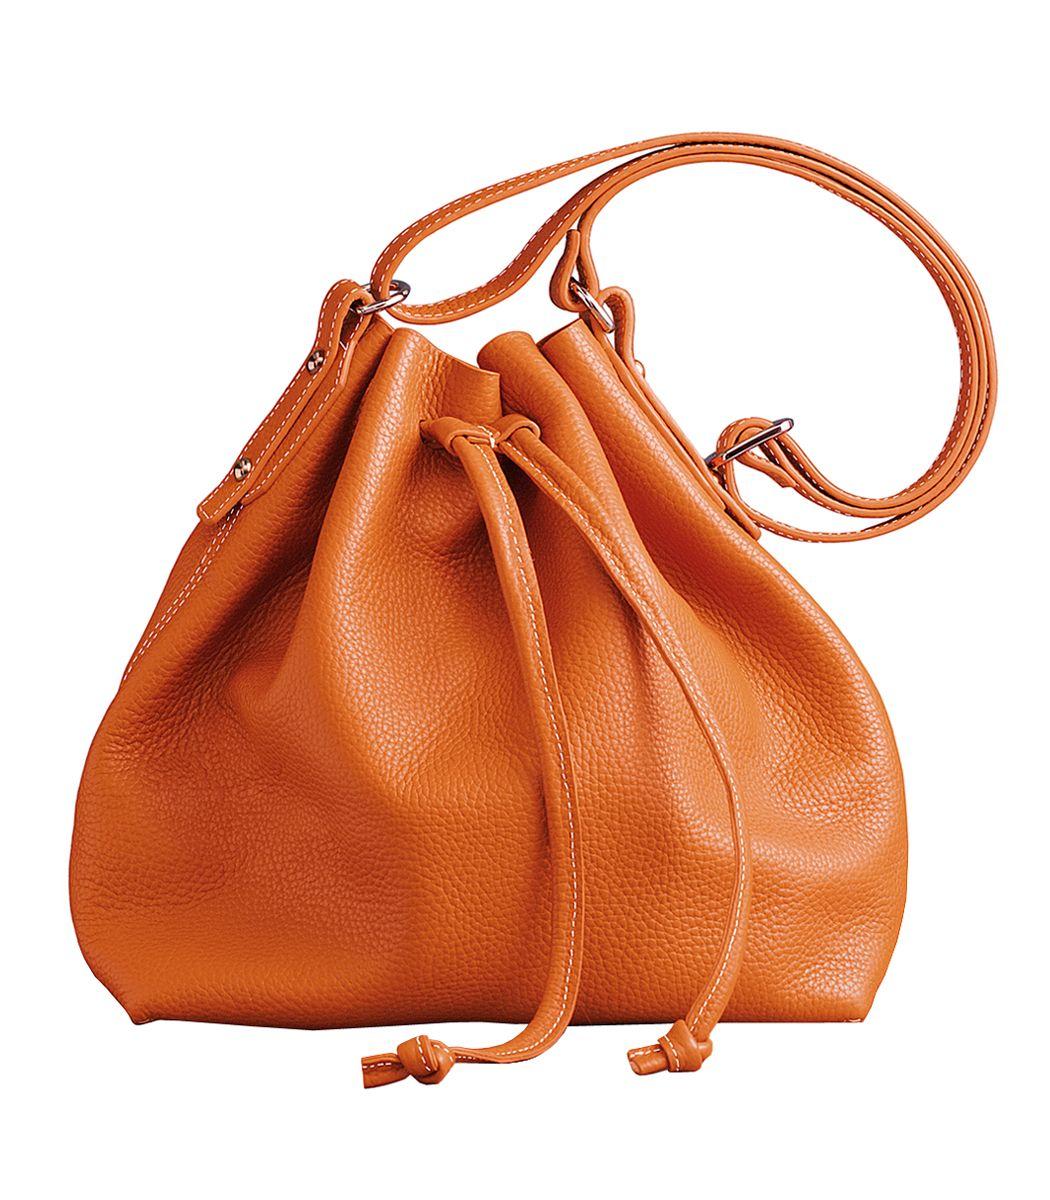 8c56fbd31d71d8 Best Handbags, Luxury Handbags, Fashion Handbags, Yellow Shoulder Bags,  Cheap Michael Kors